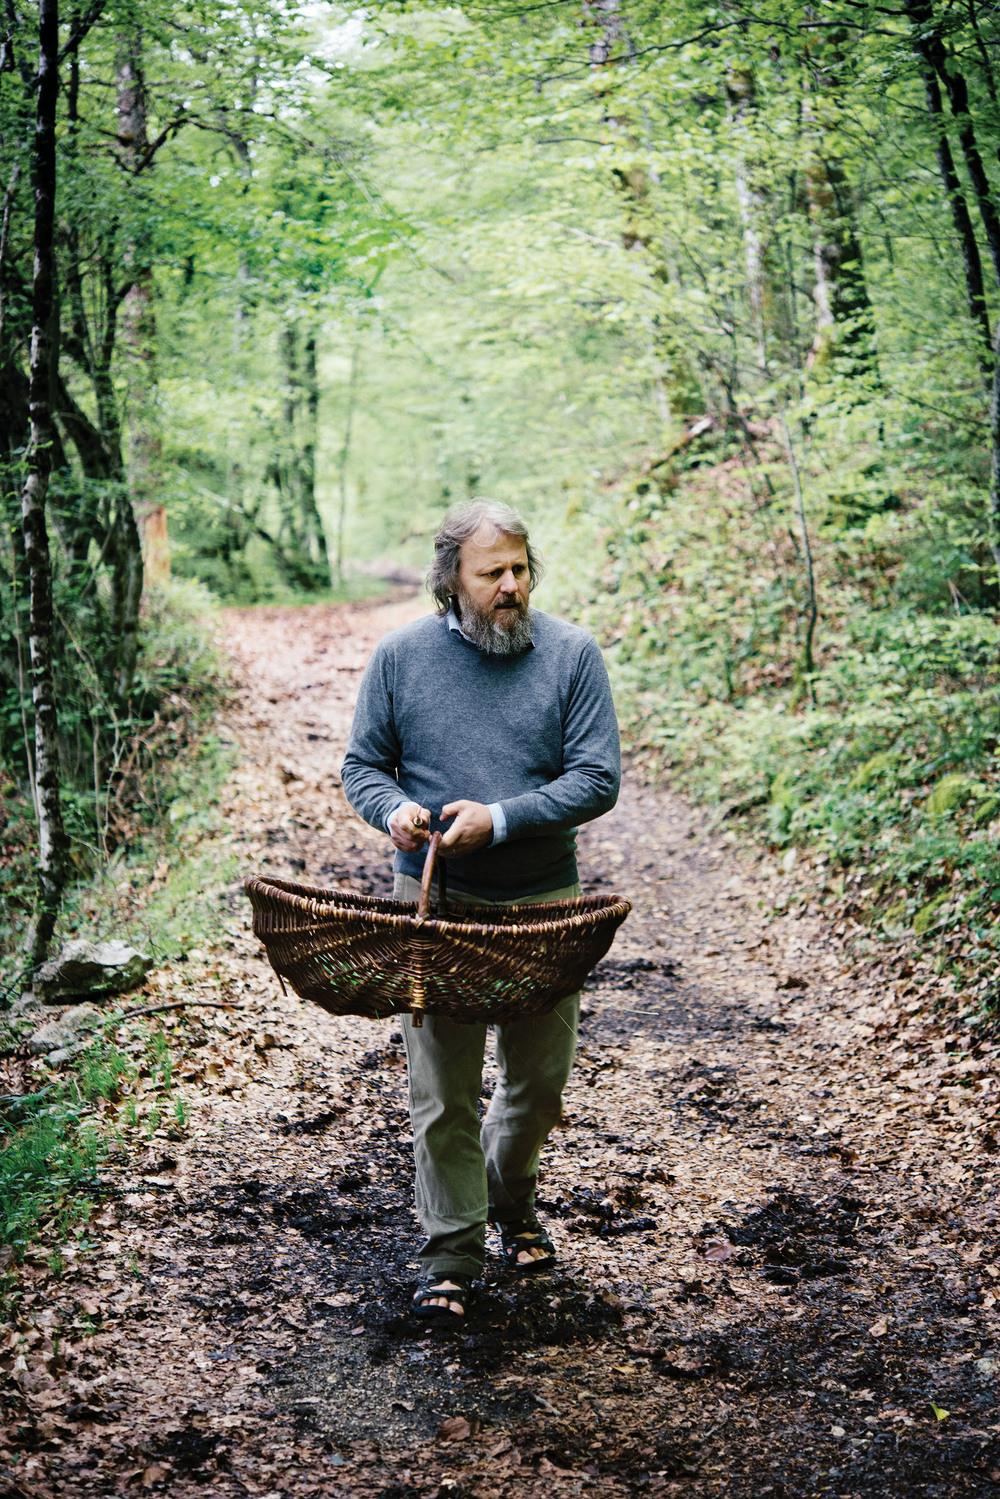 Stéphane在法國阿爾卑斯山中的蔥仁谷採草藥